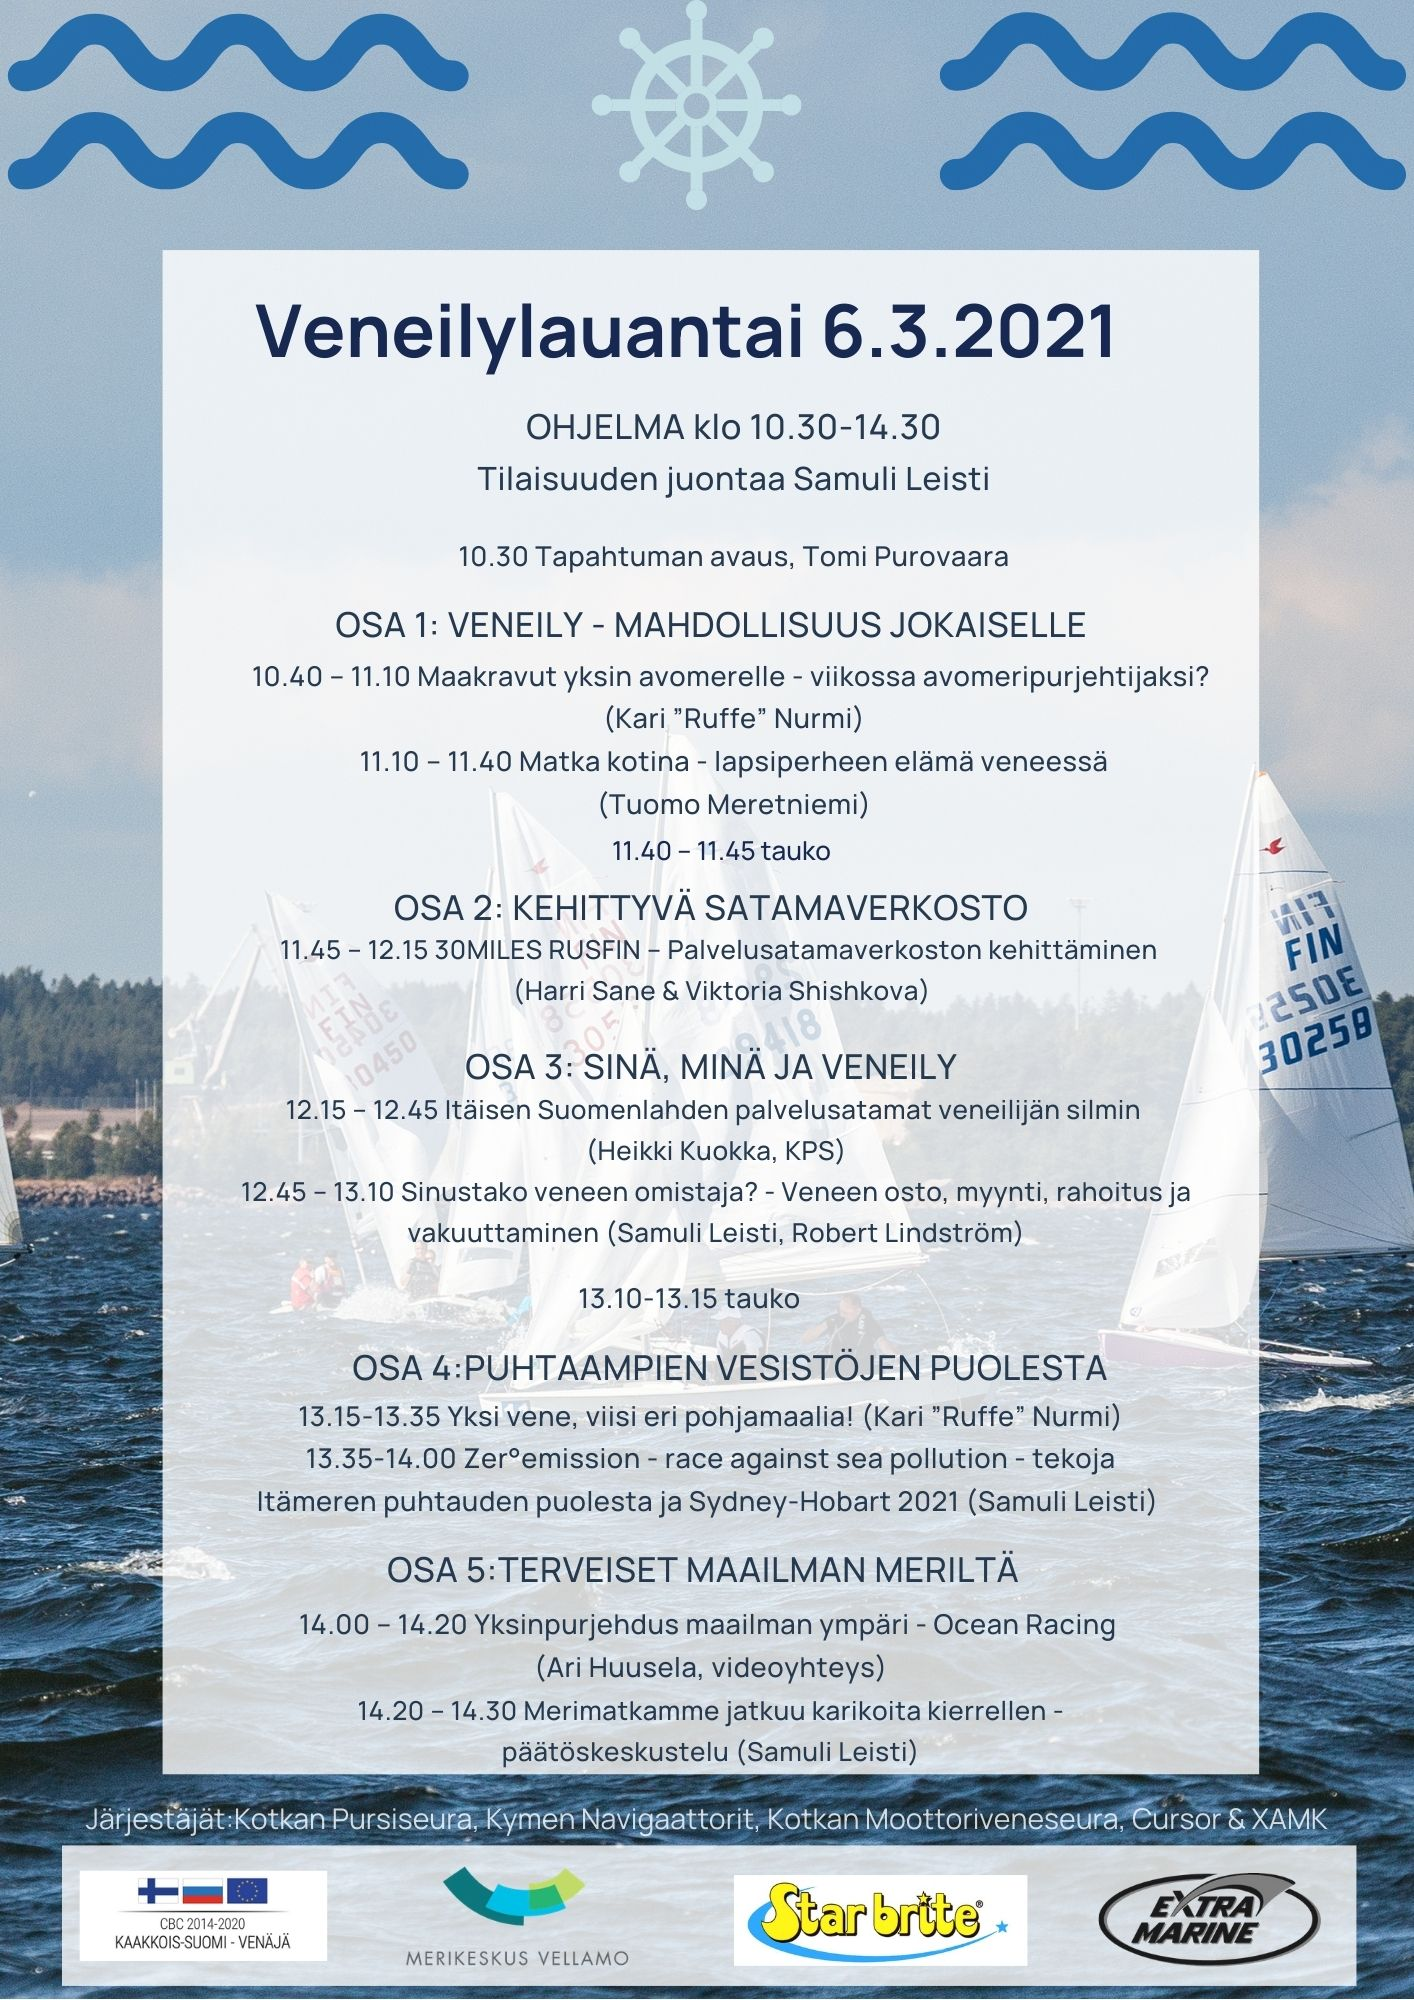 Veneilylauantai ohjelma 6.3.2021 FIN-8